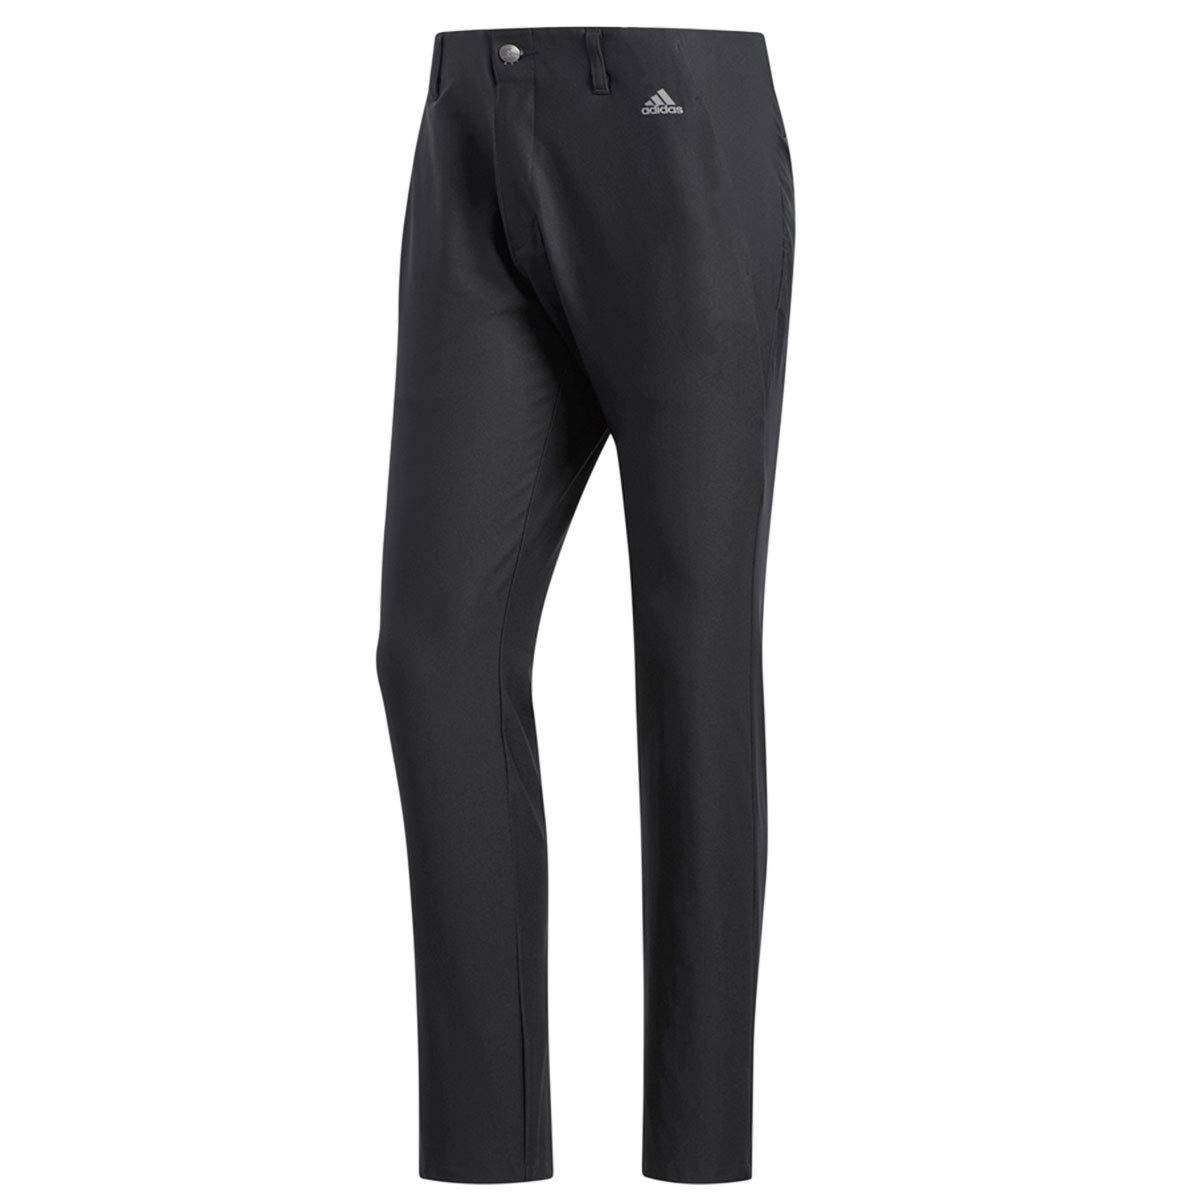 Adidas Herren Jogginghose B07MP76JX2 Hosen Hosen Hosen Angenehmes Gefühl 21b655